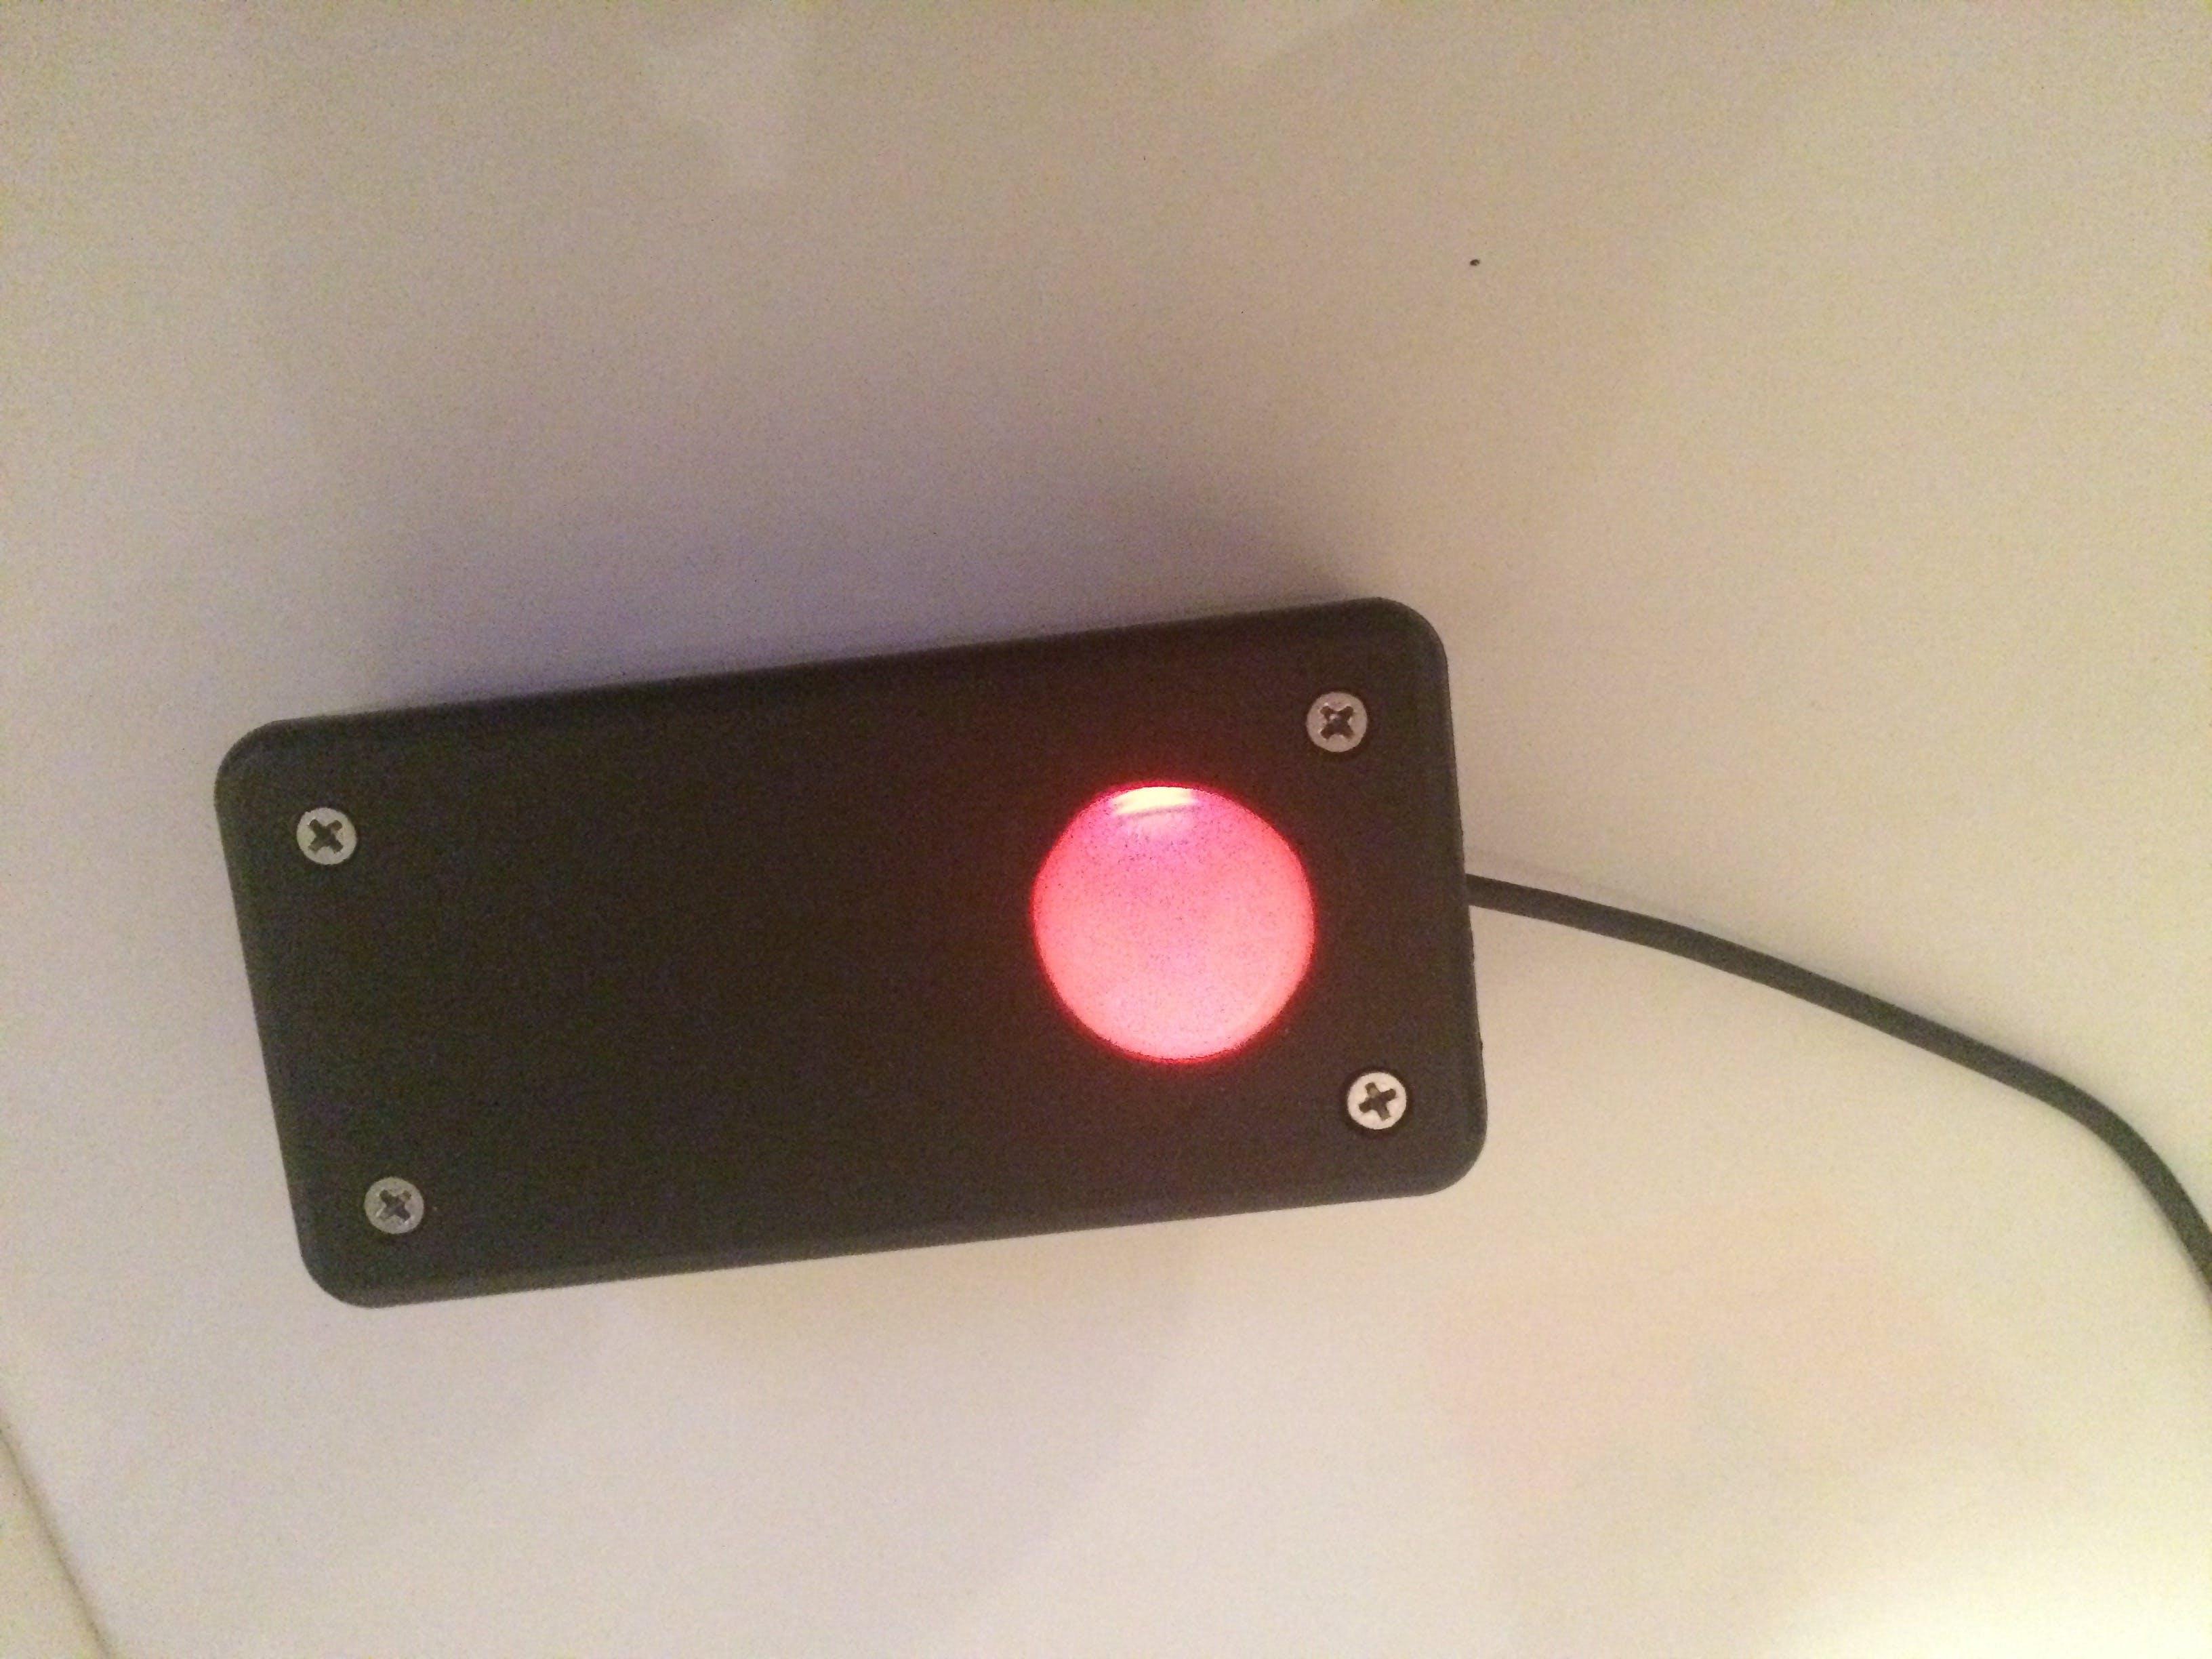 Tripped Sensor